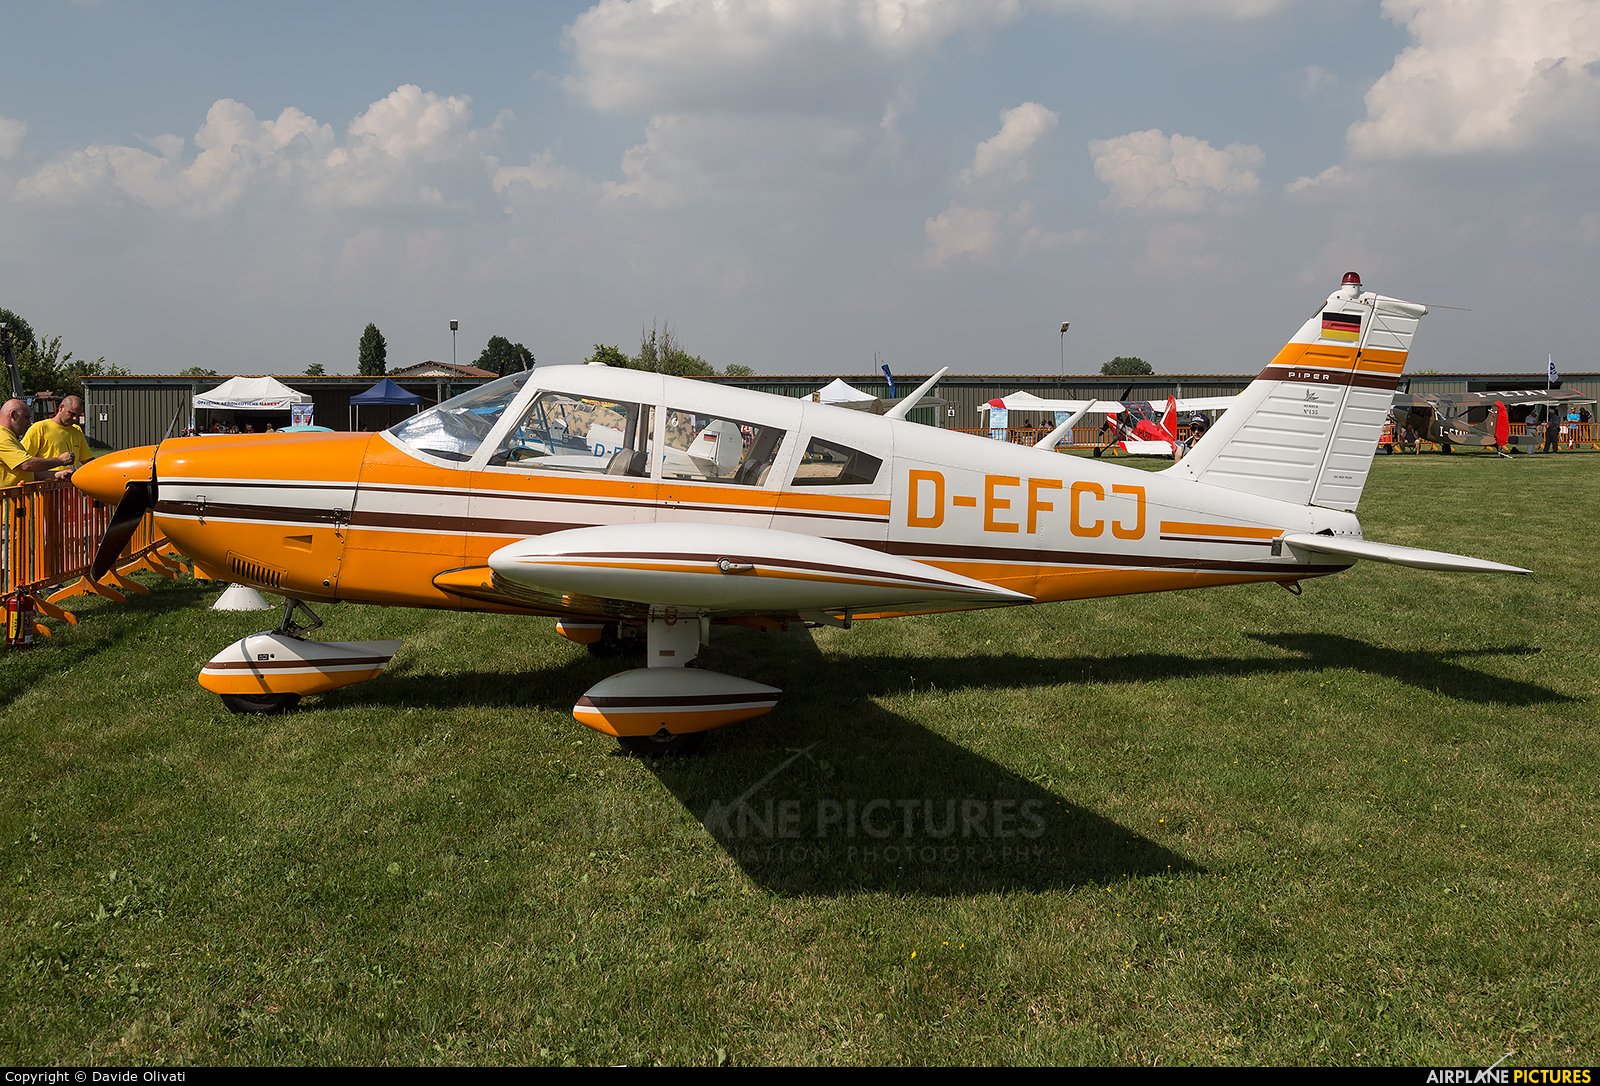 Private D-EFCJ aircraft at Montagnana